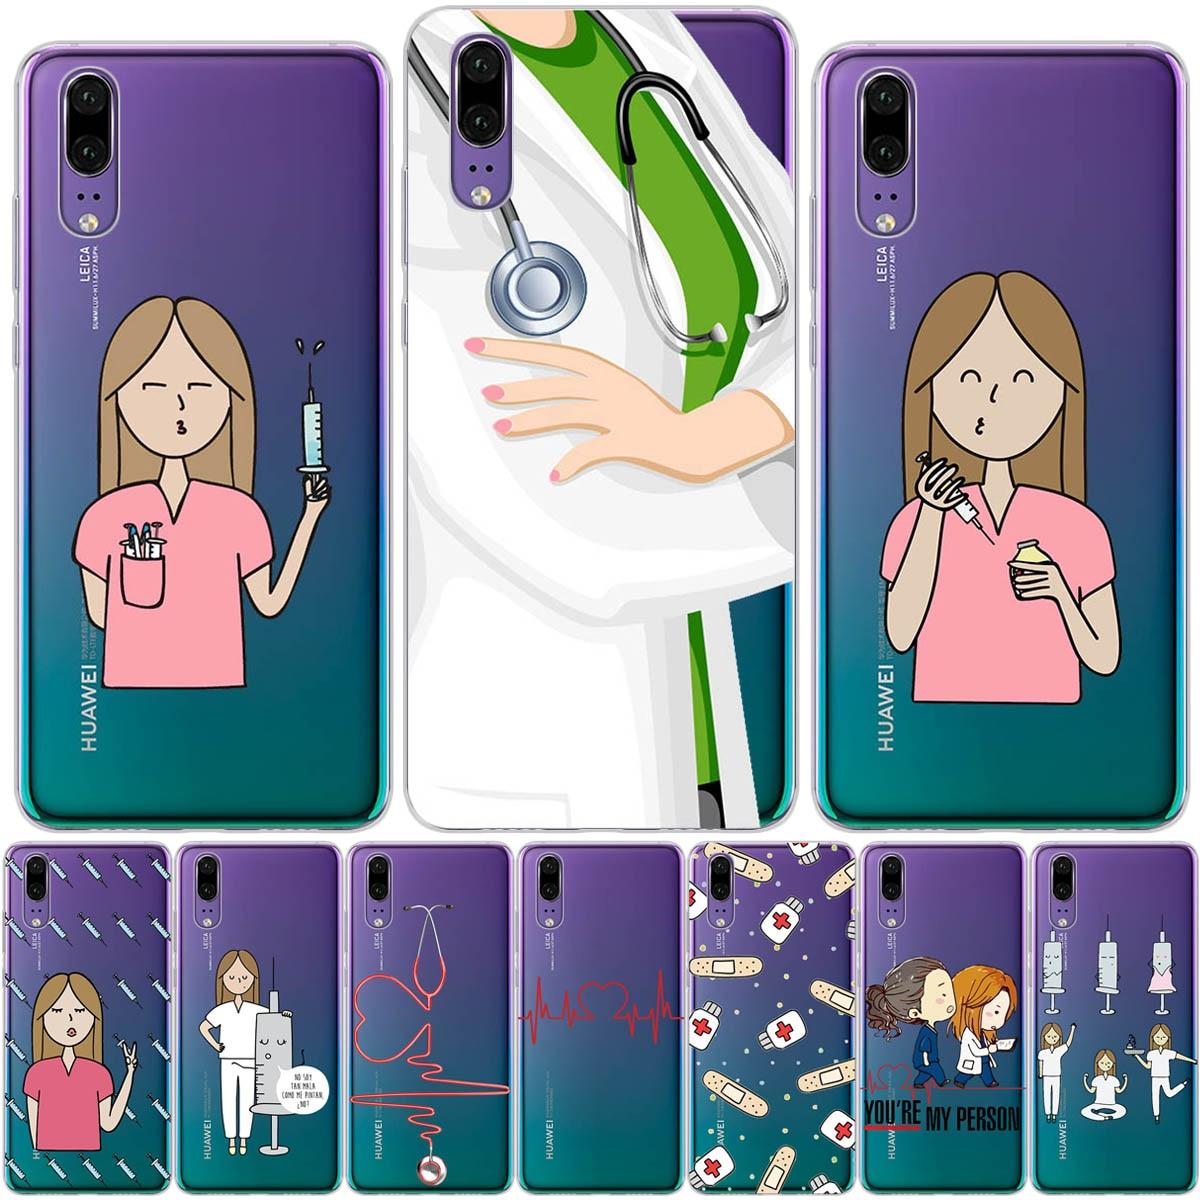 Doctor enfermera salud corazón silicona suave TPU Funda para teléfono Funda para Huawei P8 P9 Lite 2017 P10 P20 P30 Lite Pro Funda